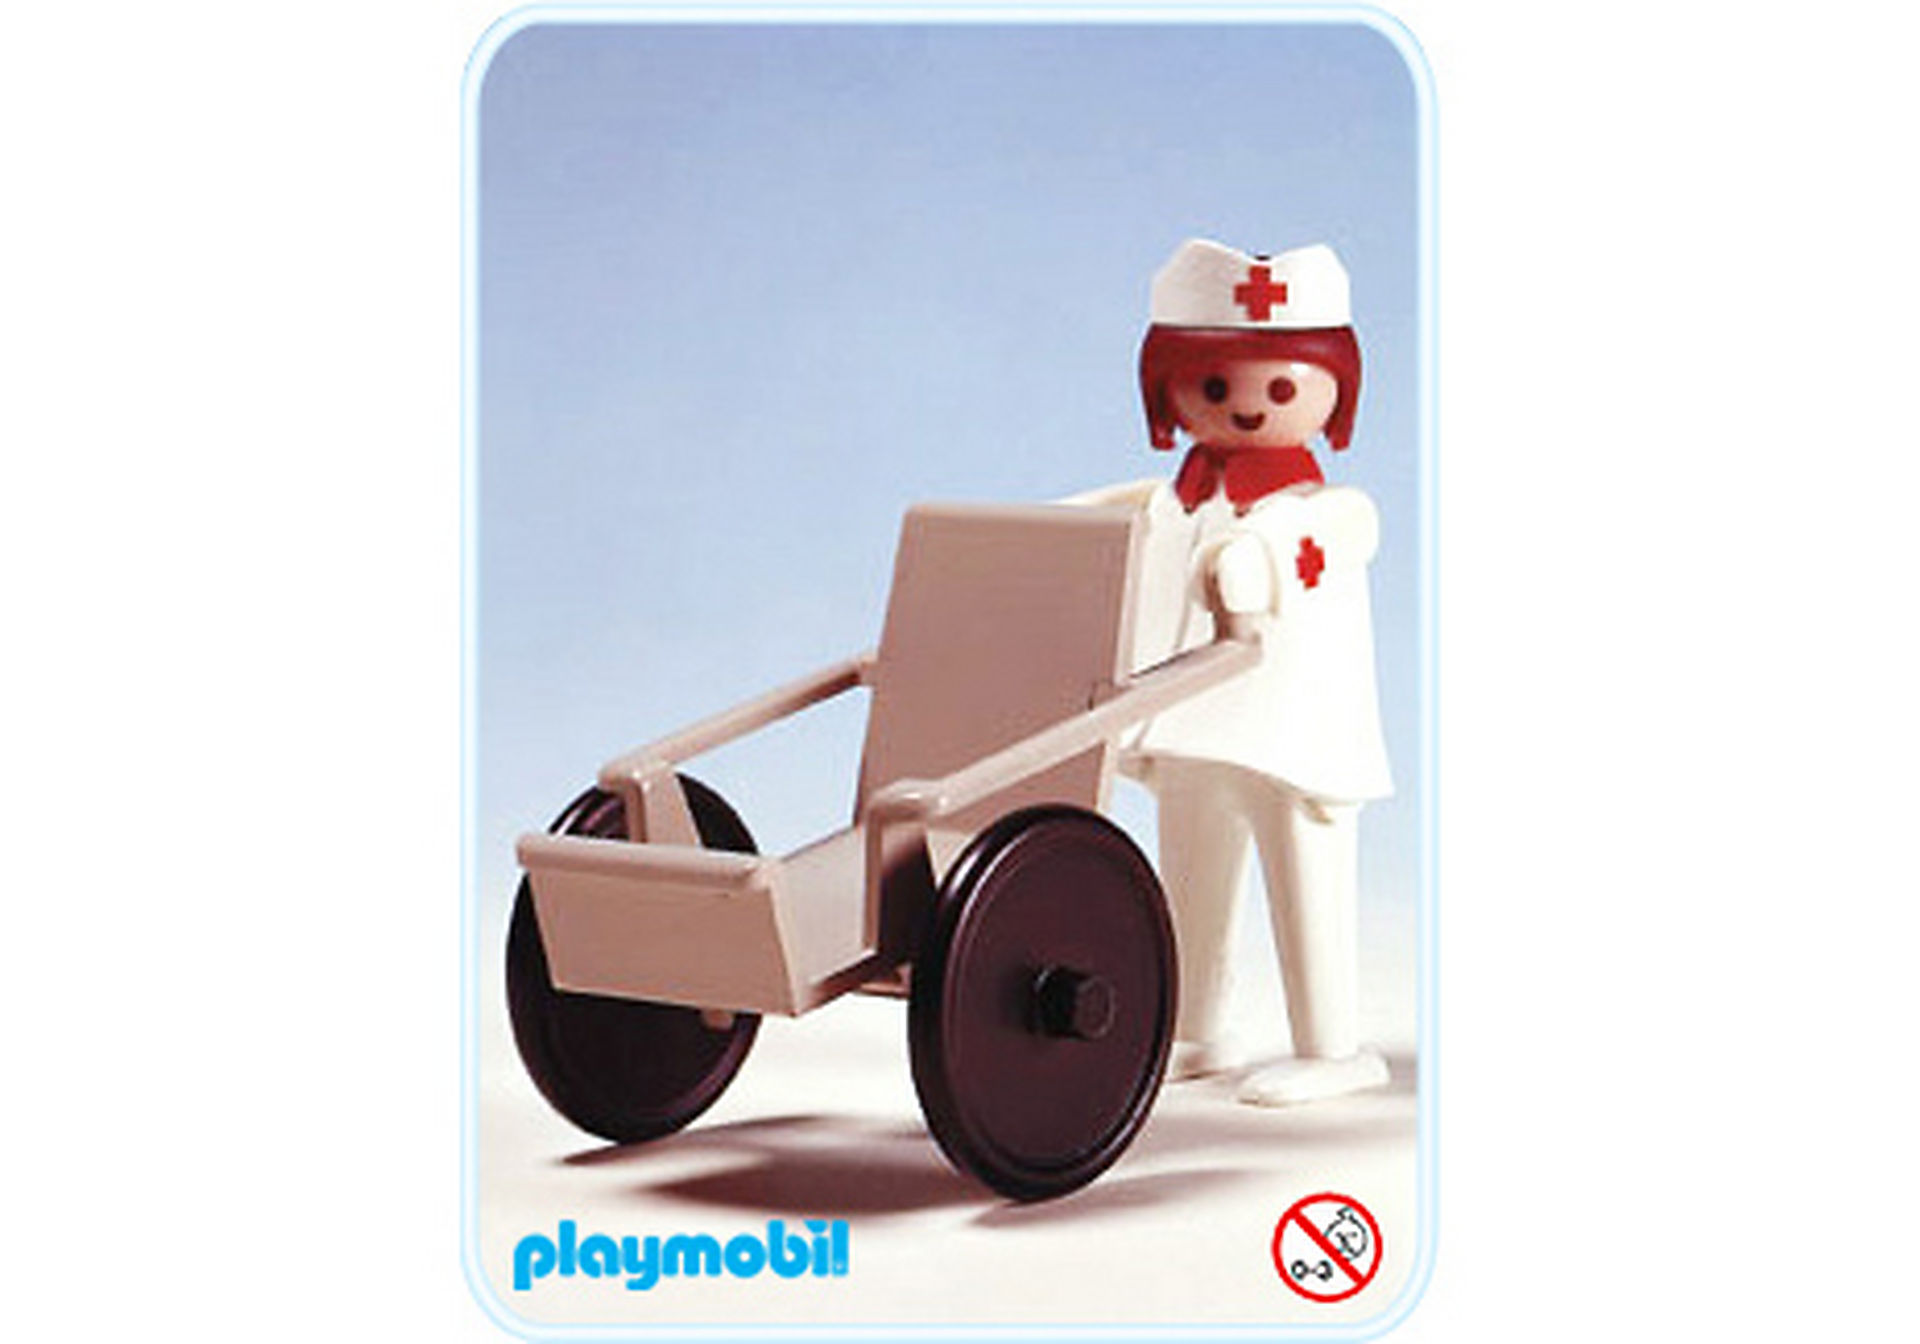 3362-A Krankenschwester/Rollstuhl zoom image1